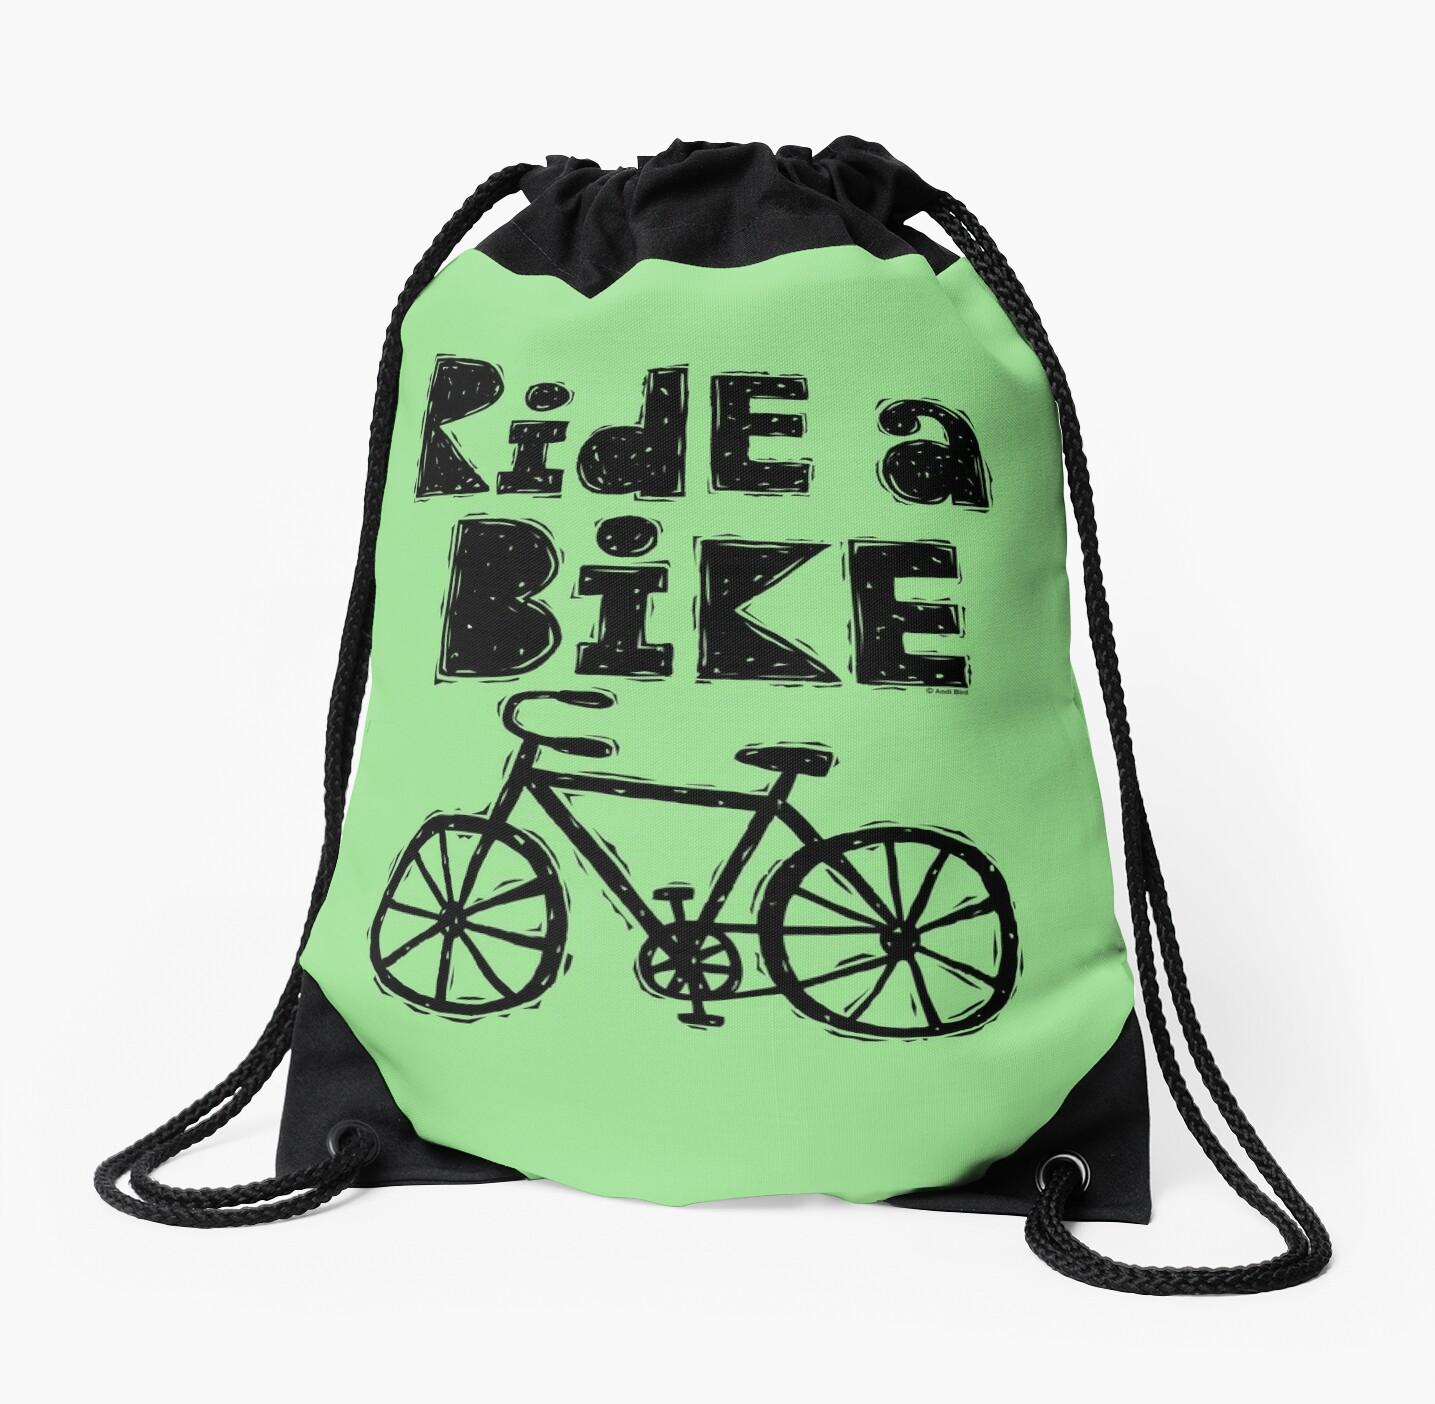 Ride a Bike - woody by Andi Bird